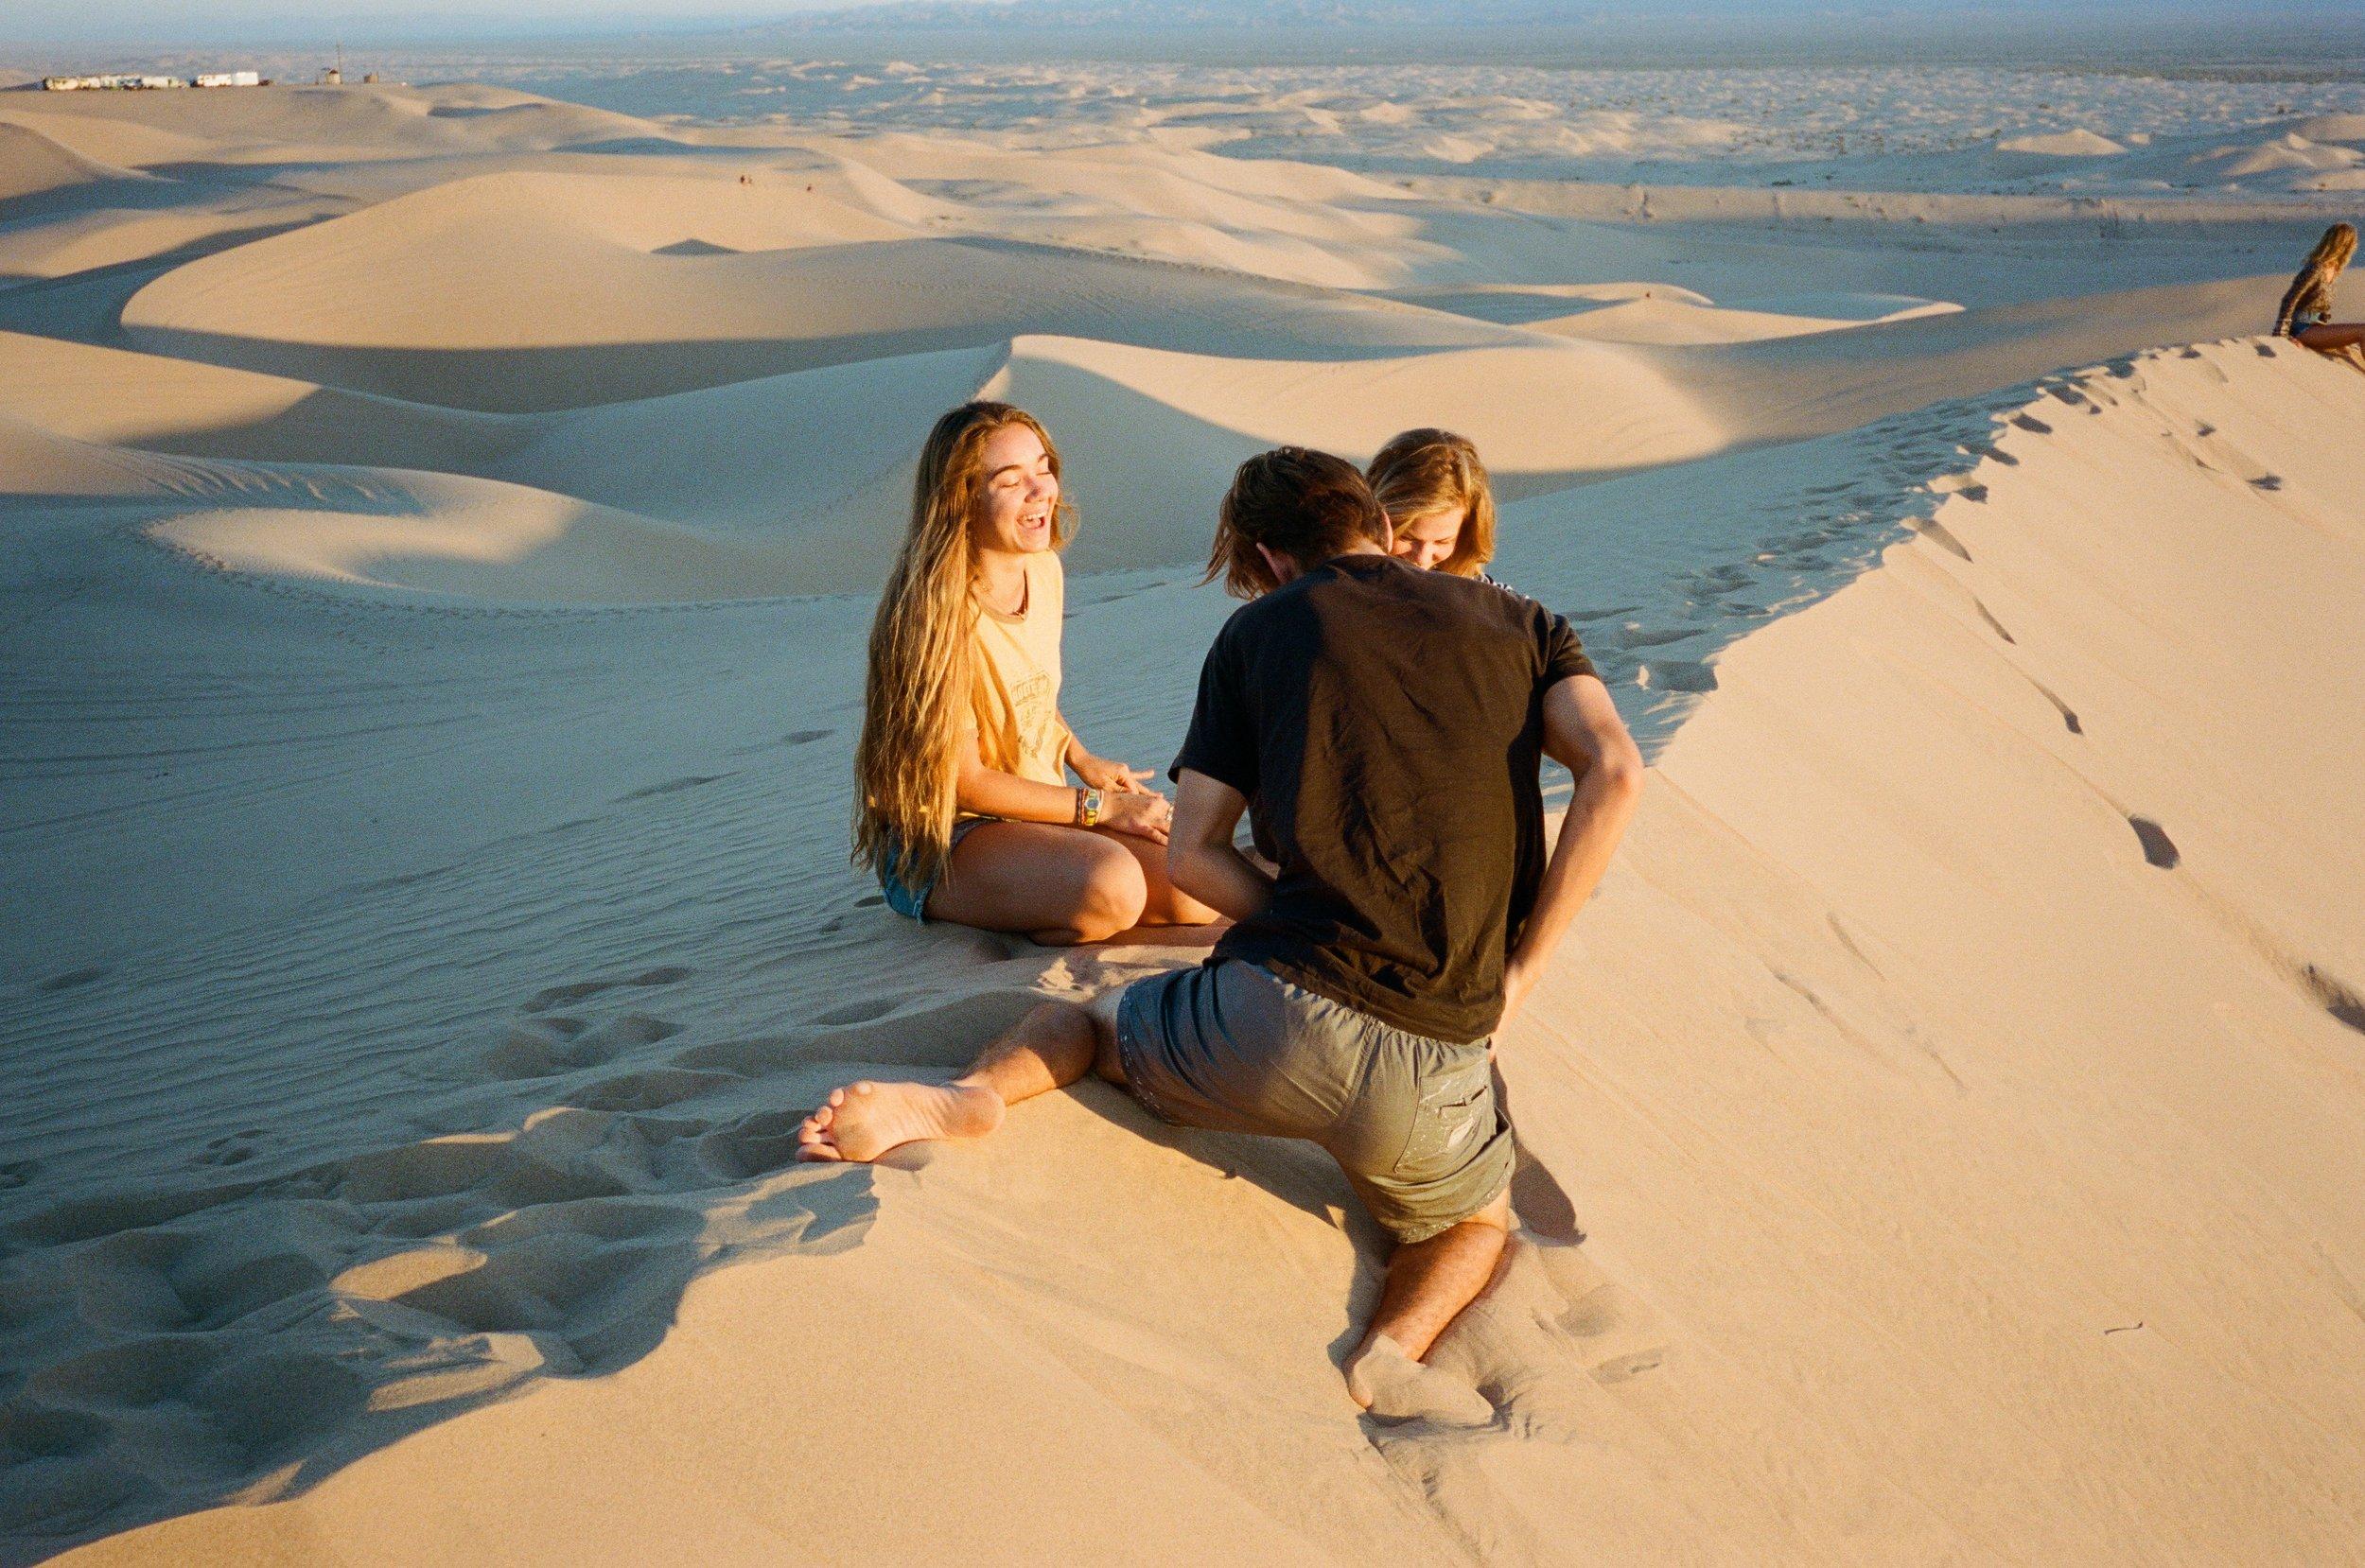 Sand Dunes_#9871-4.jpg